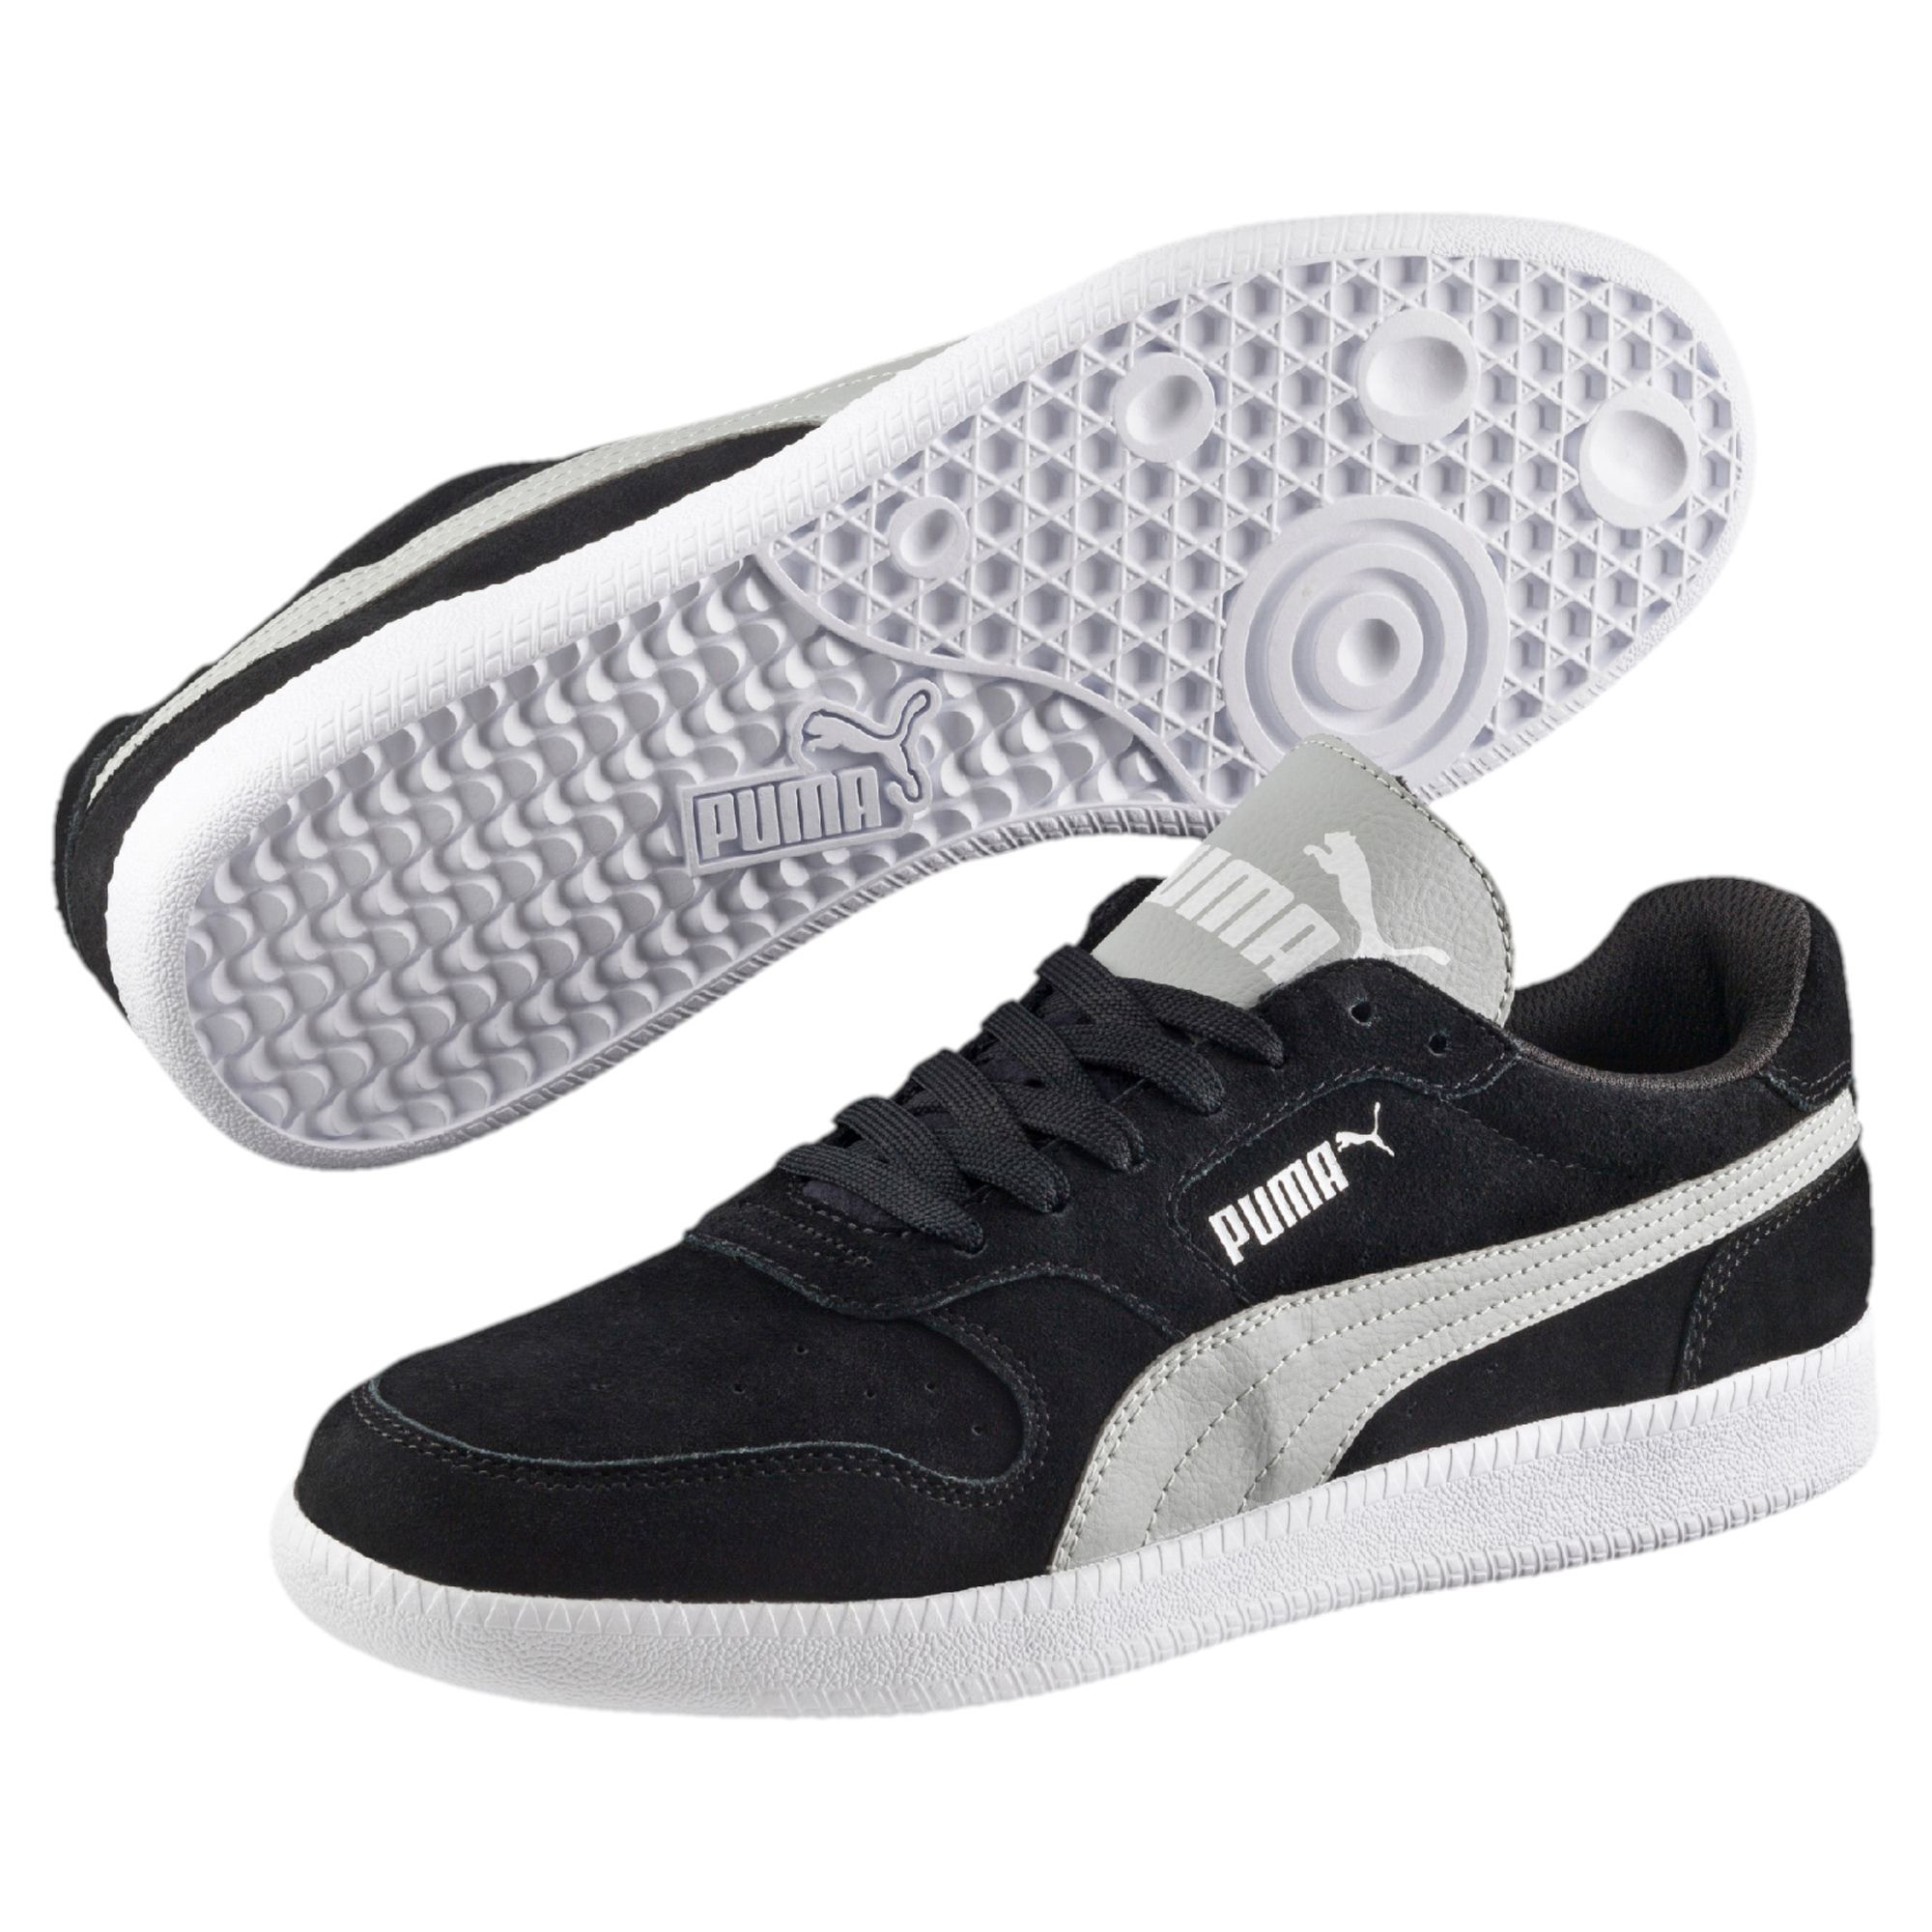 Image Puma Icra Suede Men's Sneakers #2